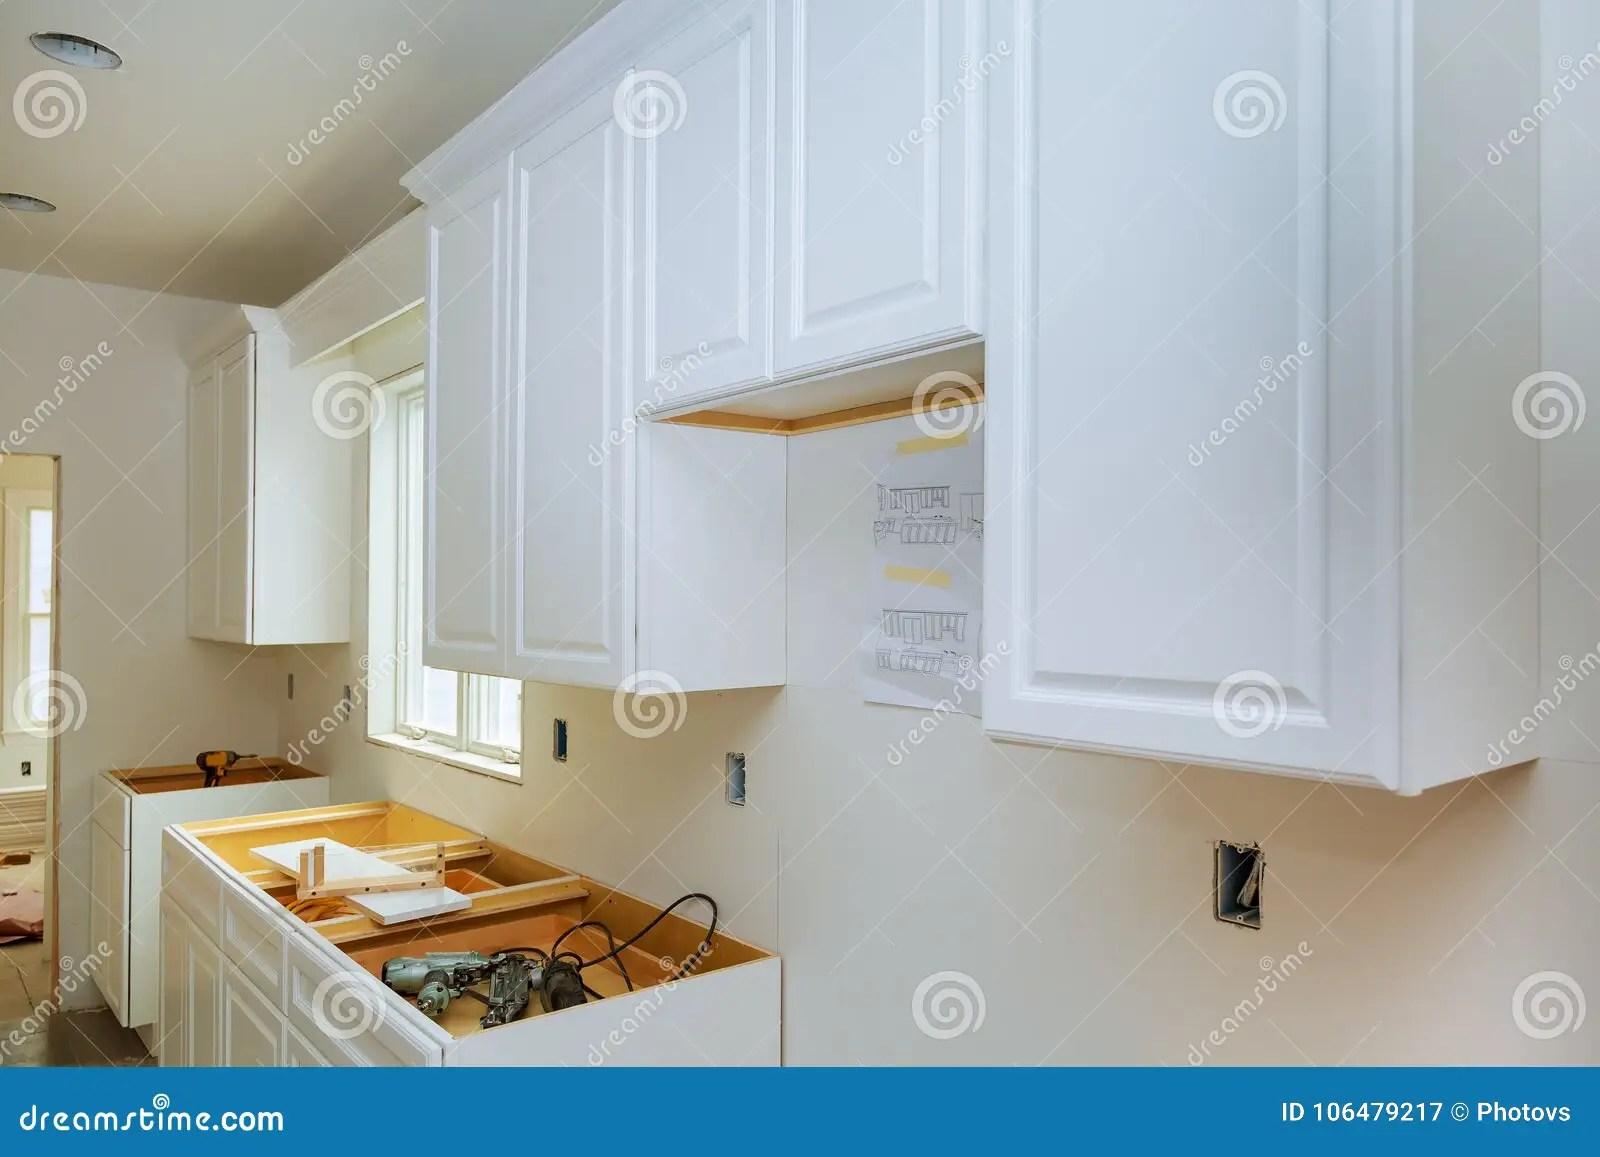 kitchen remodel pictures barbie playset 在一个新的厨房改造看法安装的住所改善厨房库存图片 图片包括有海岛 在一个新的厨房改造看法安装的住所改善厨房